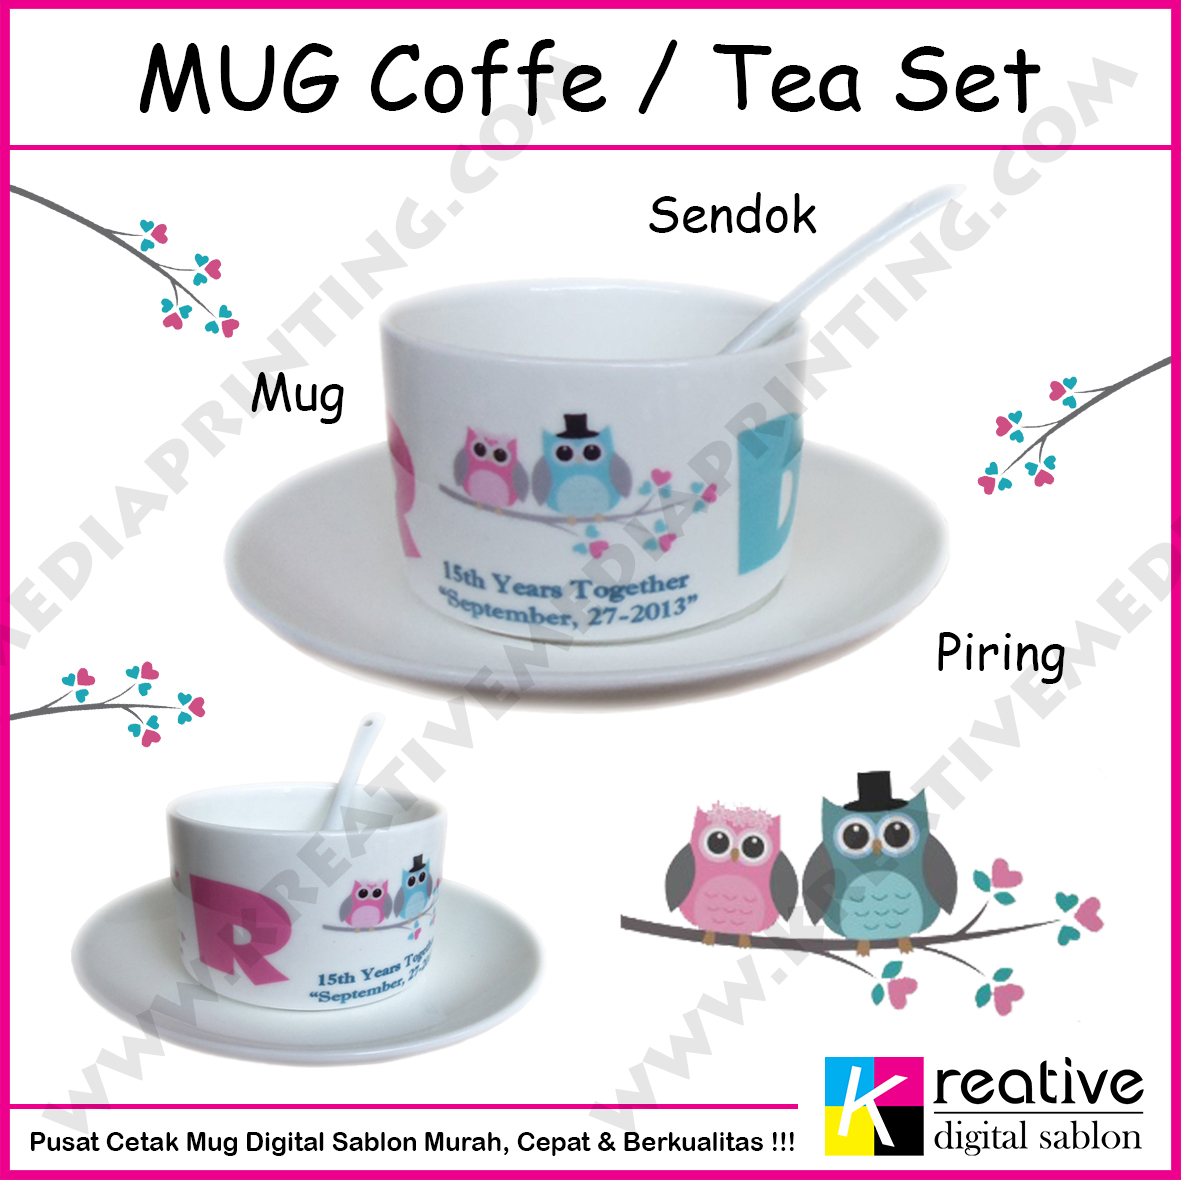 Cetak Mug Coffe Tea Set